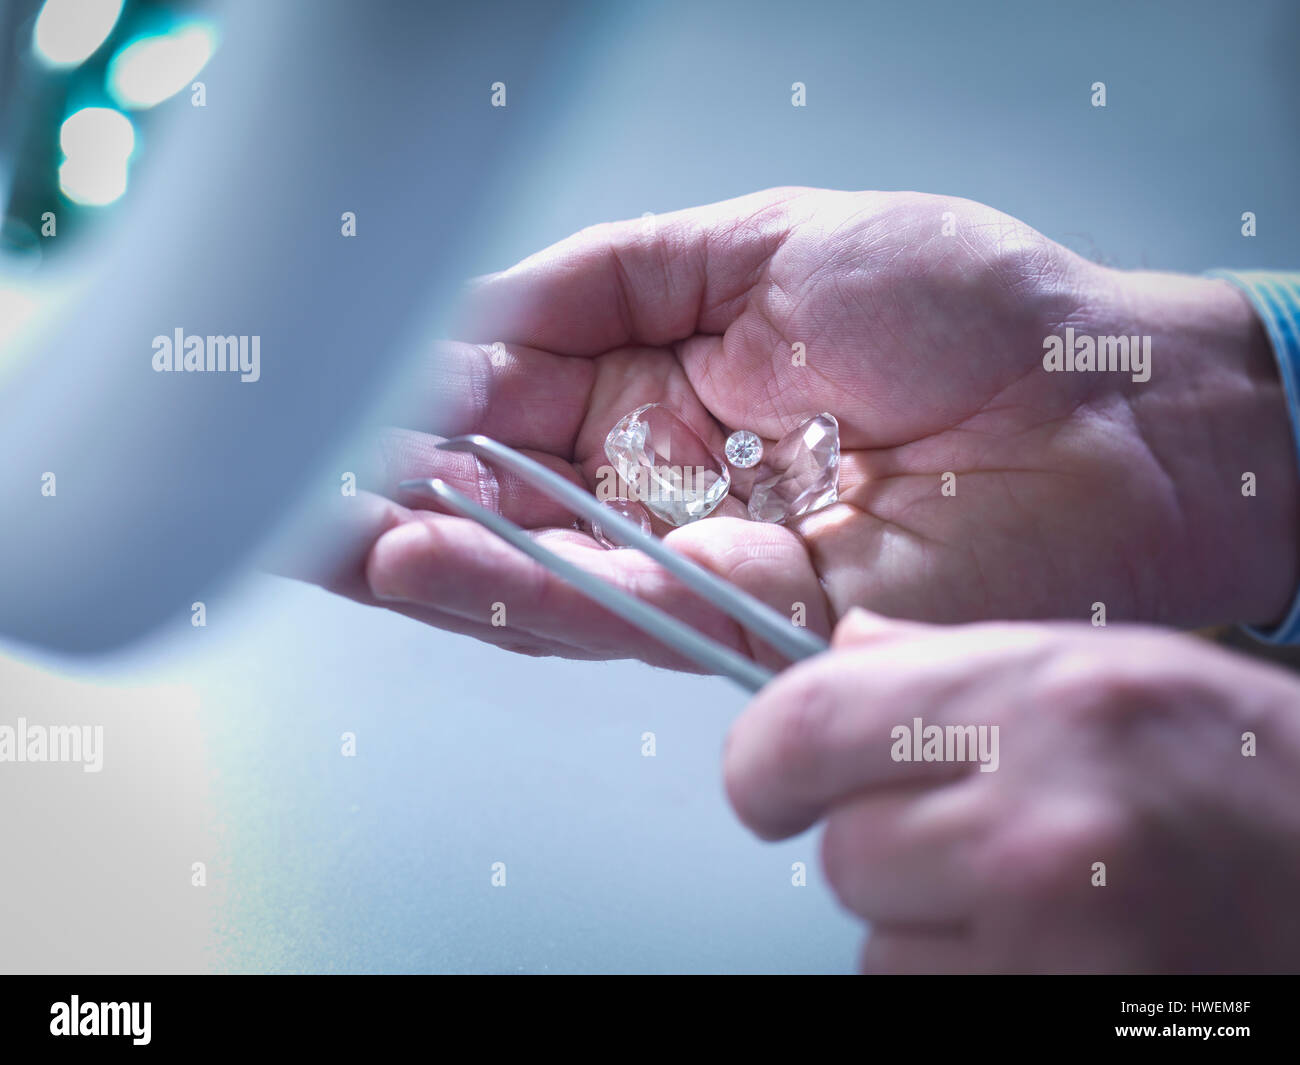 Jeweller inspecting replica diamonds in hand Stock Photo